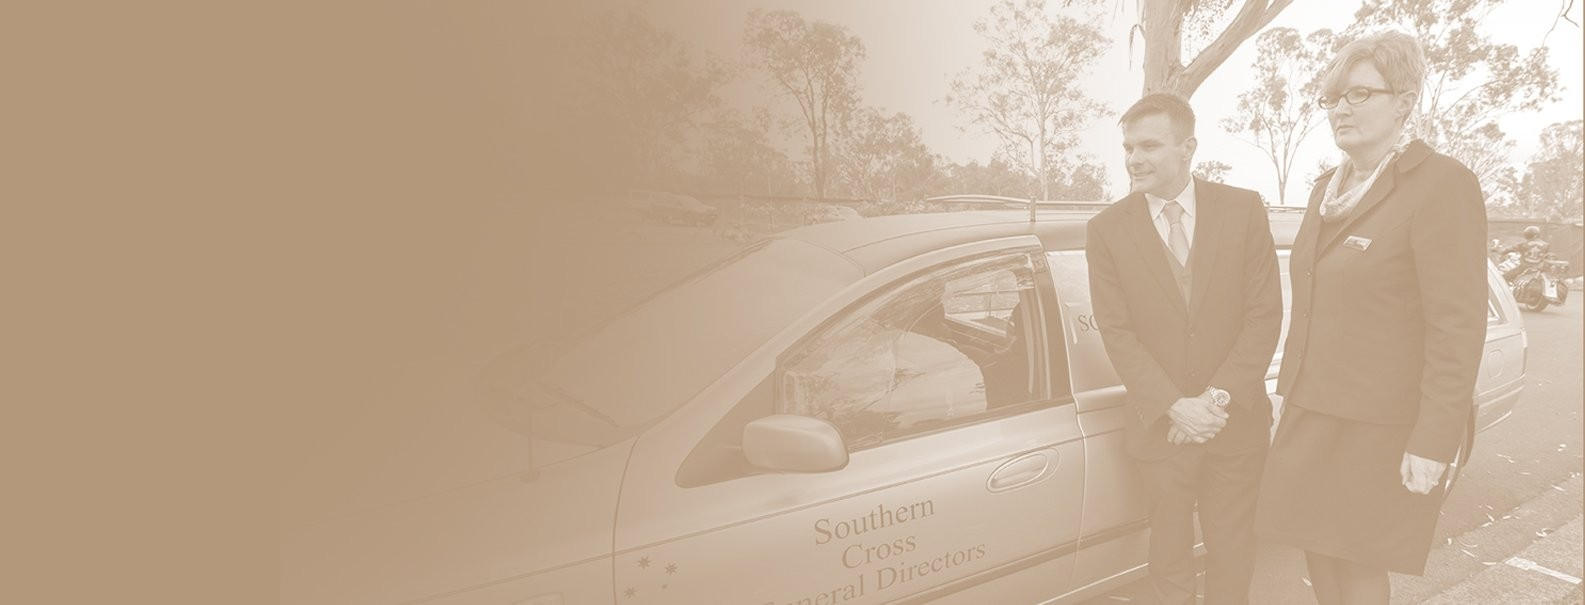 Southern Cross Funeral Directors   LinkedIn